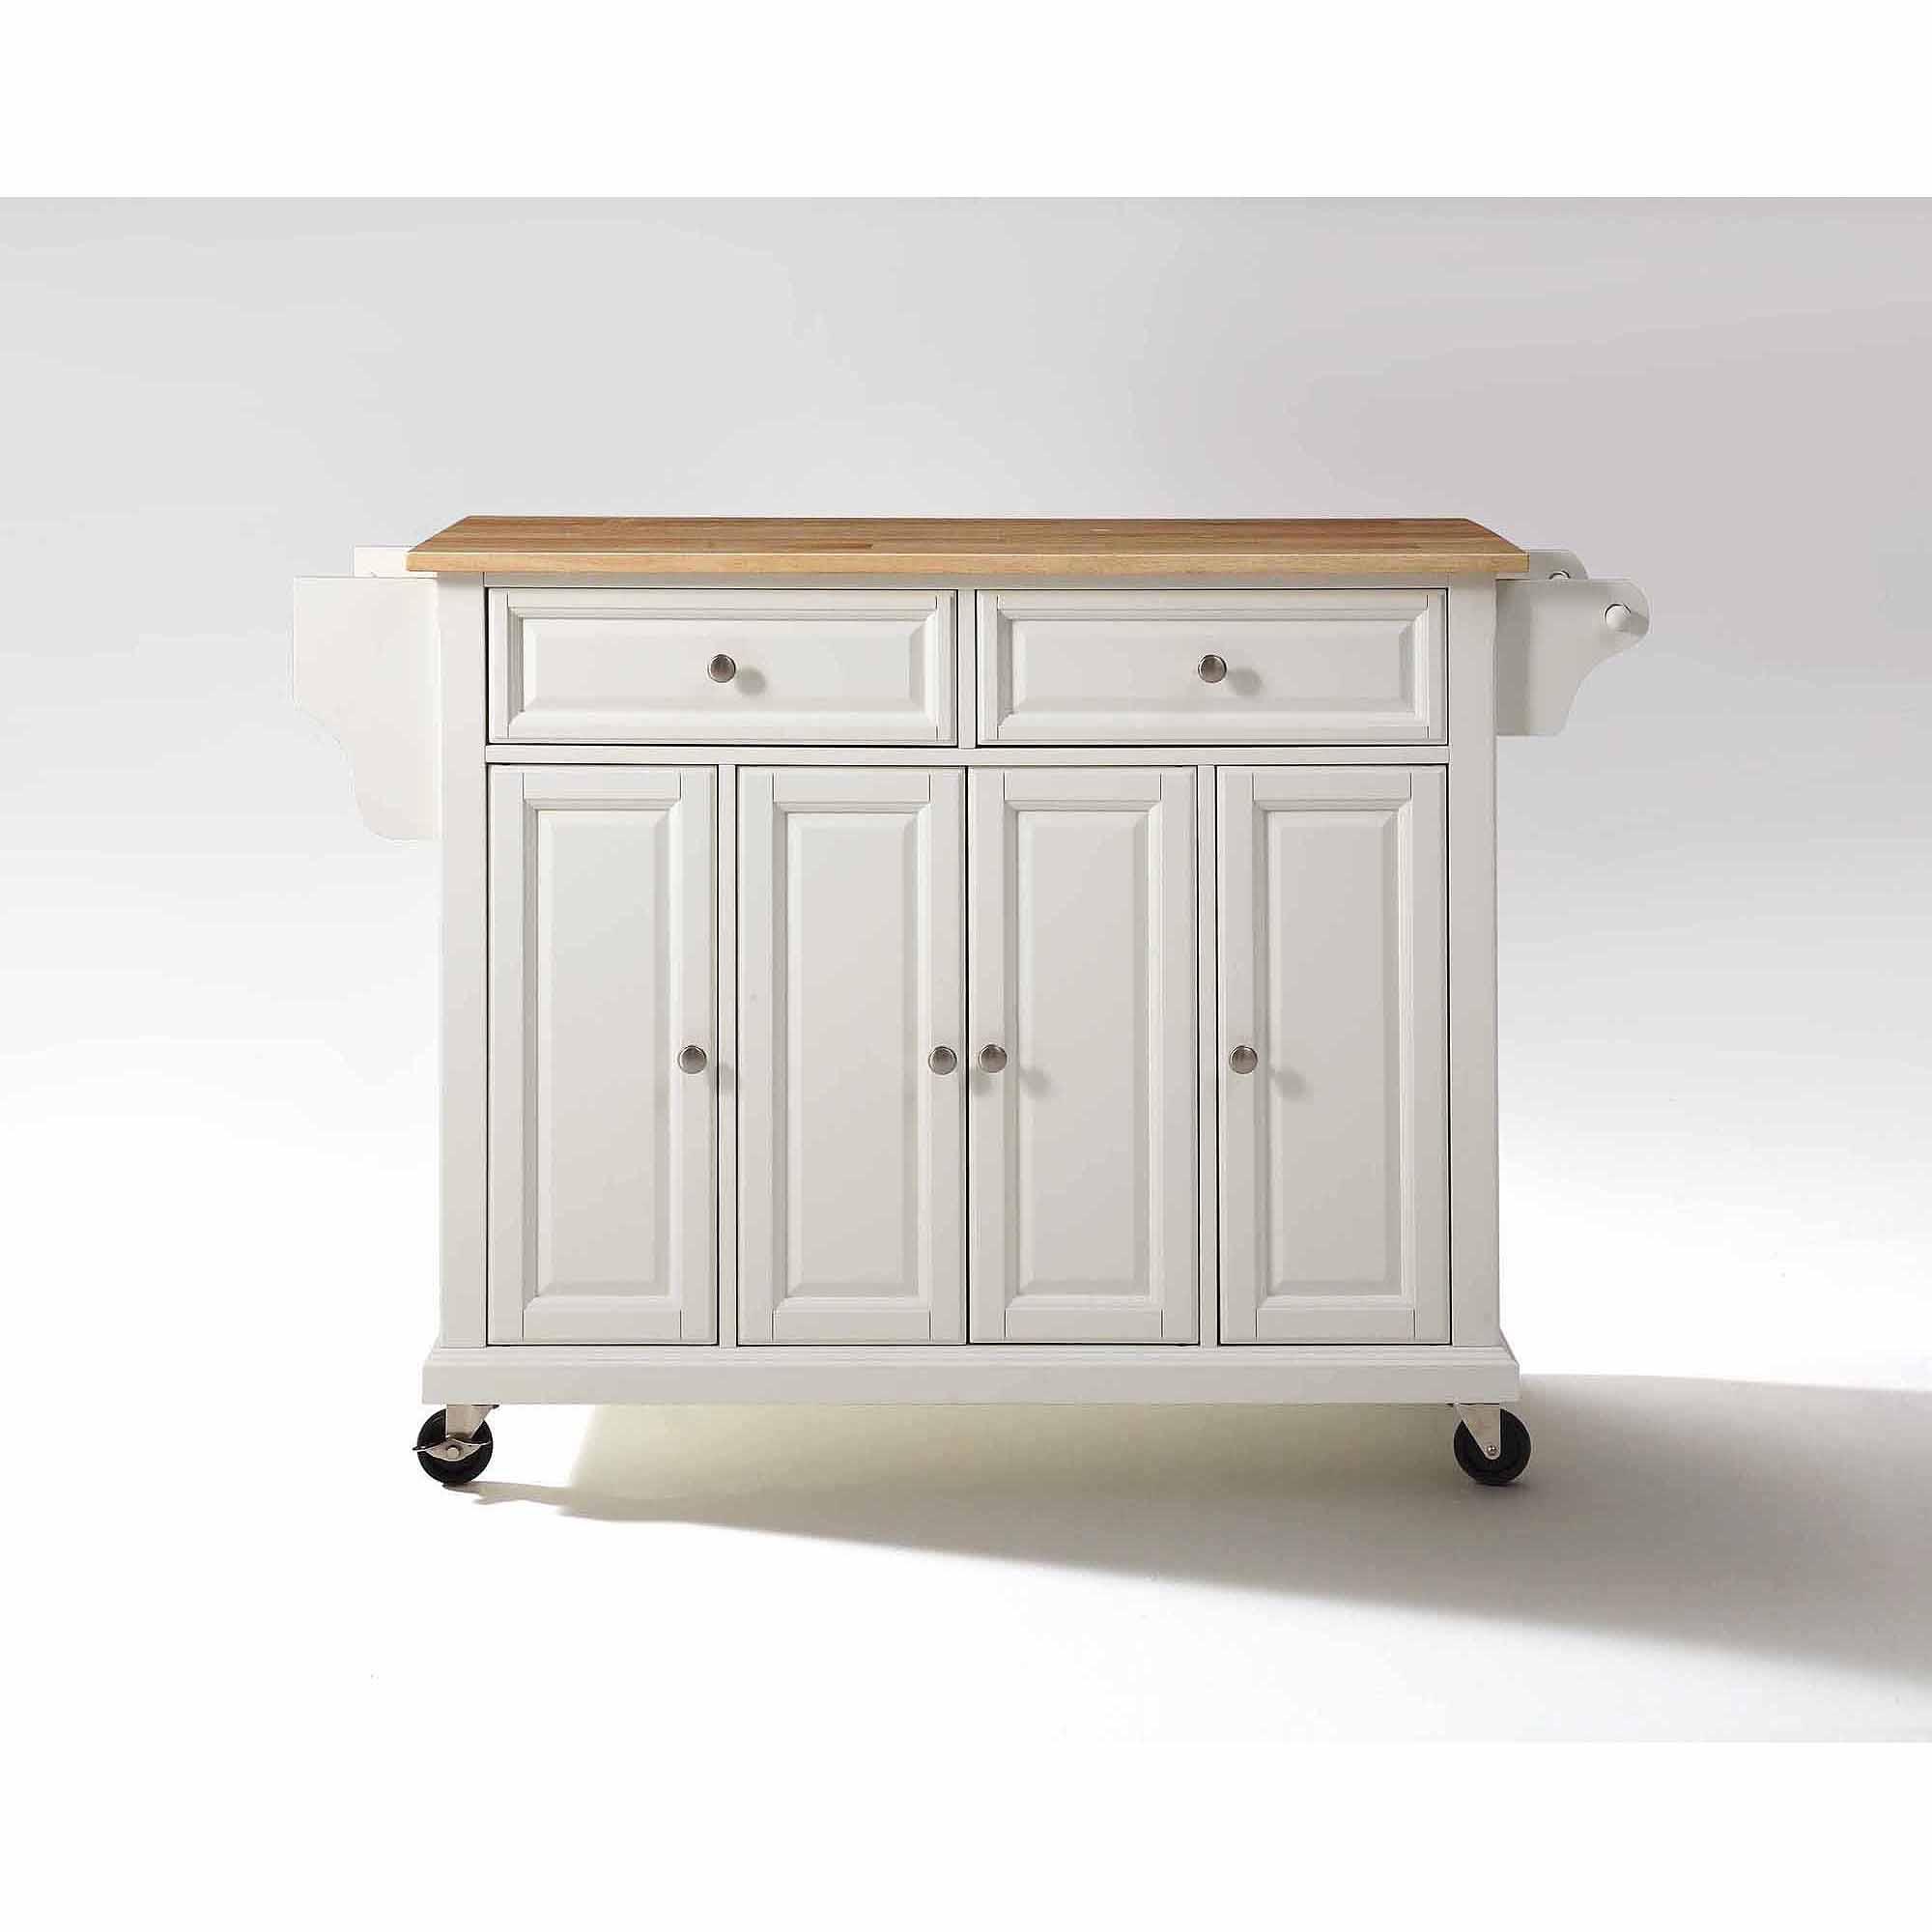 kitchen carts crosley furniture natural wood top kitchen cart - walmart.com OXMMJJL